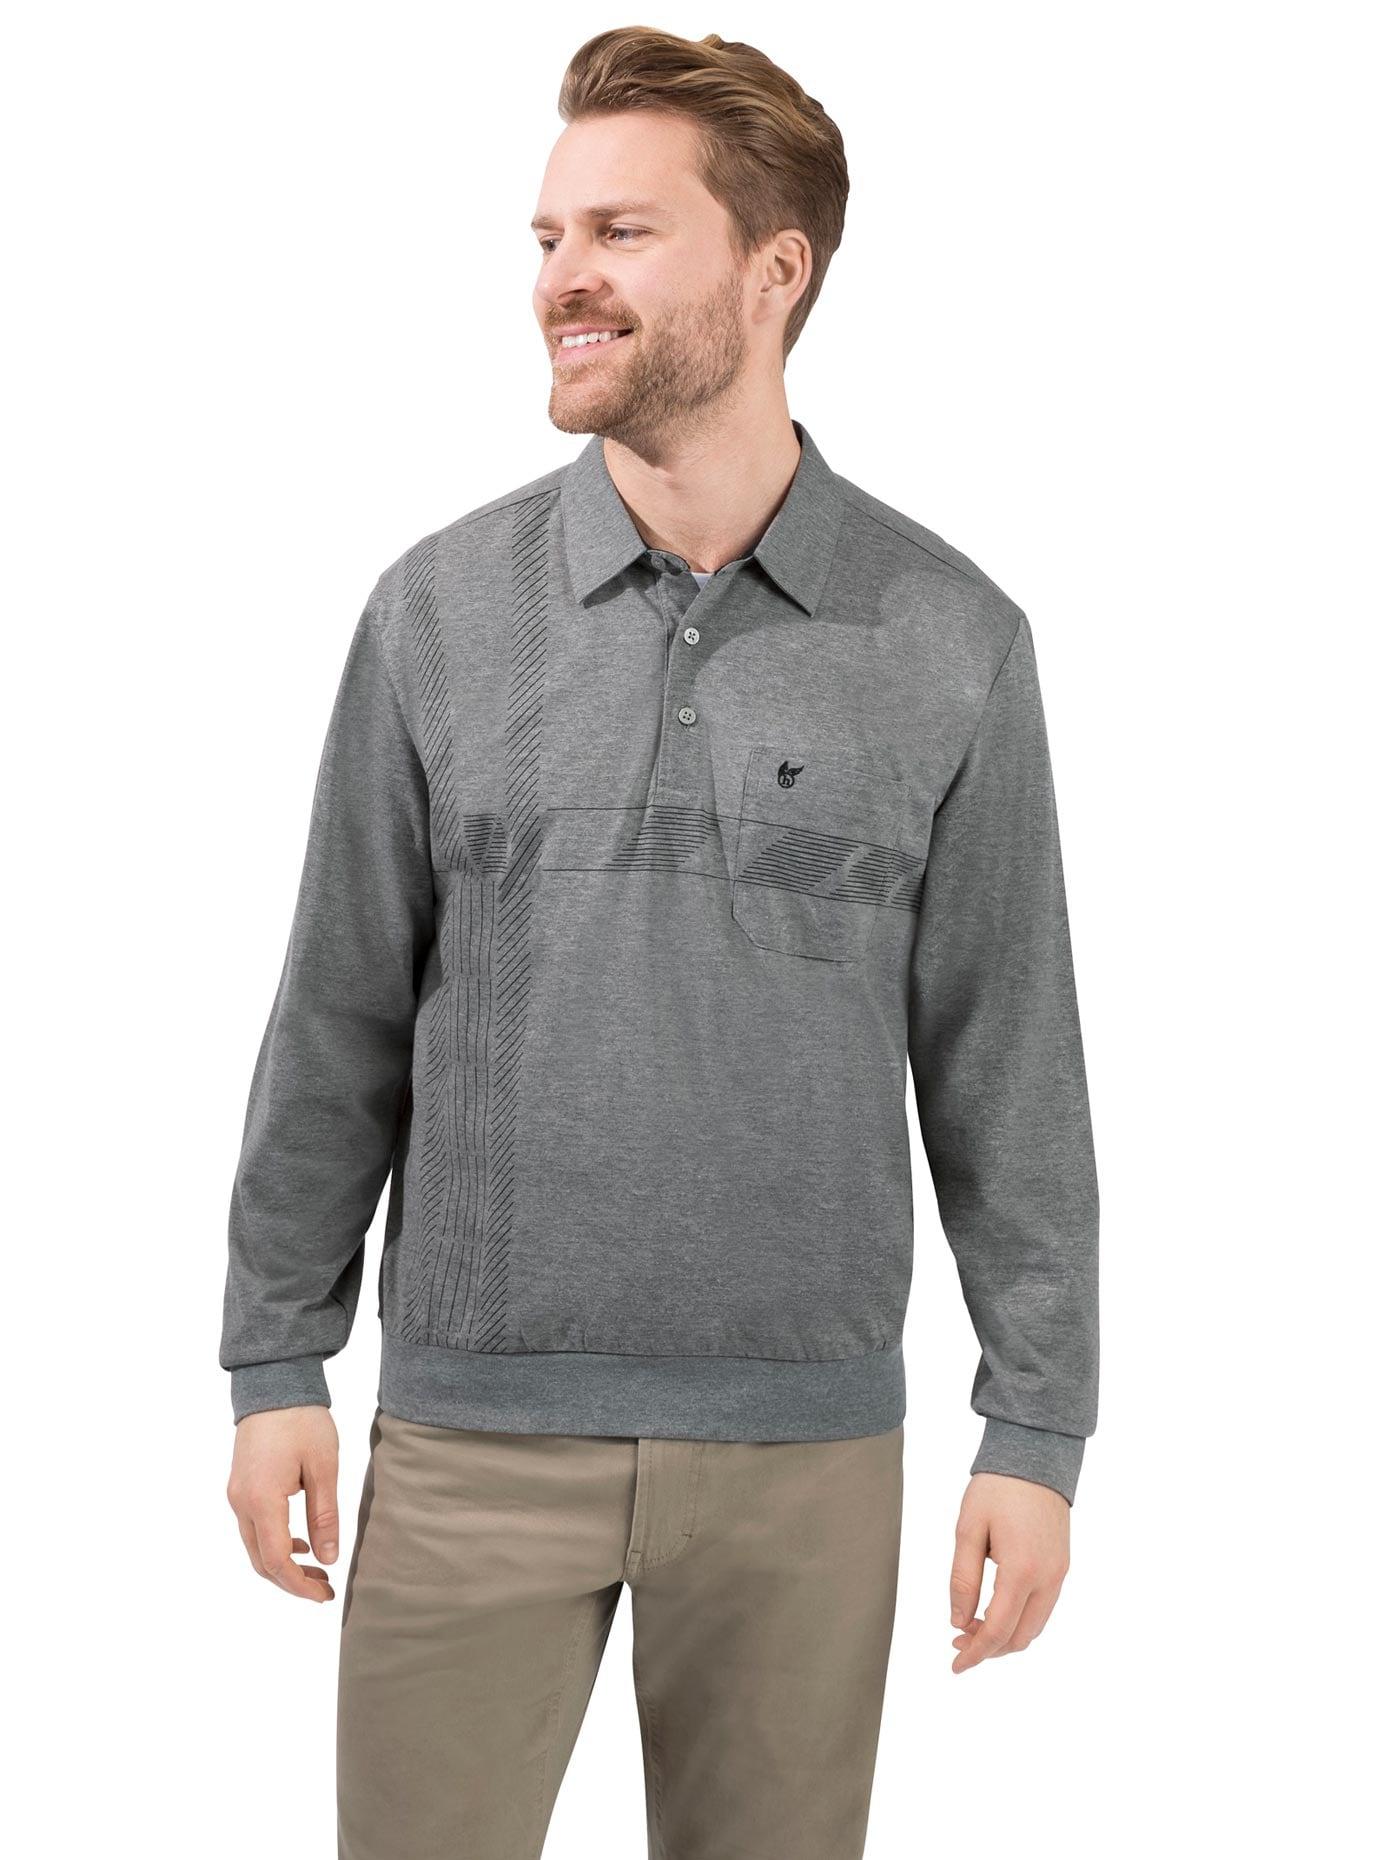 Langarm-Poloshirt grau Herren Langarm Shirts Poloshirts